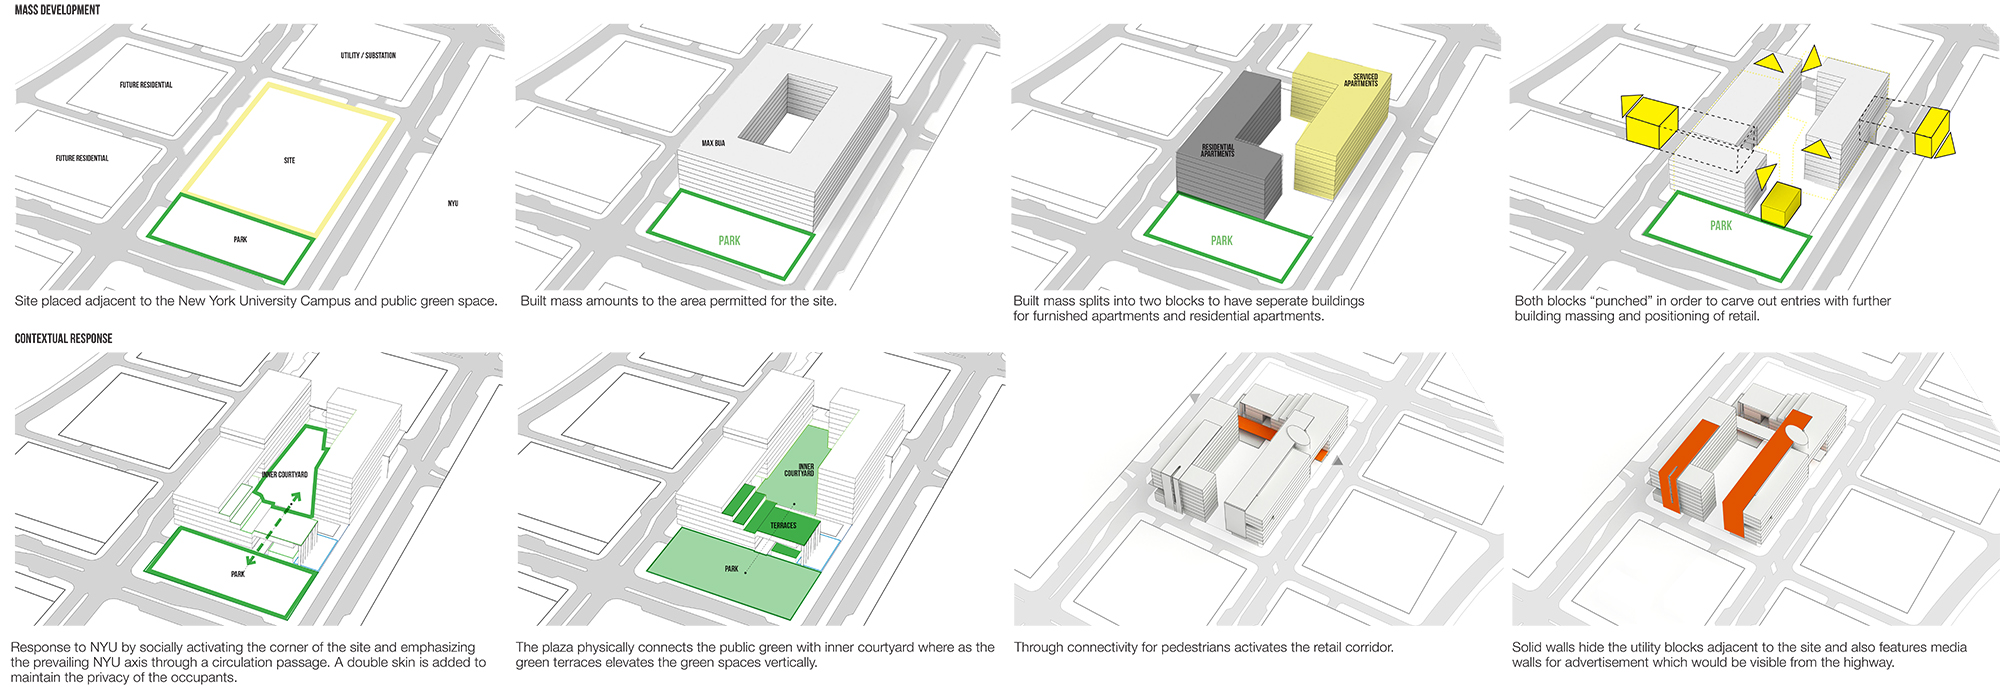 BEAD residential serviced apartments NYU diagrams2.JPG